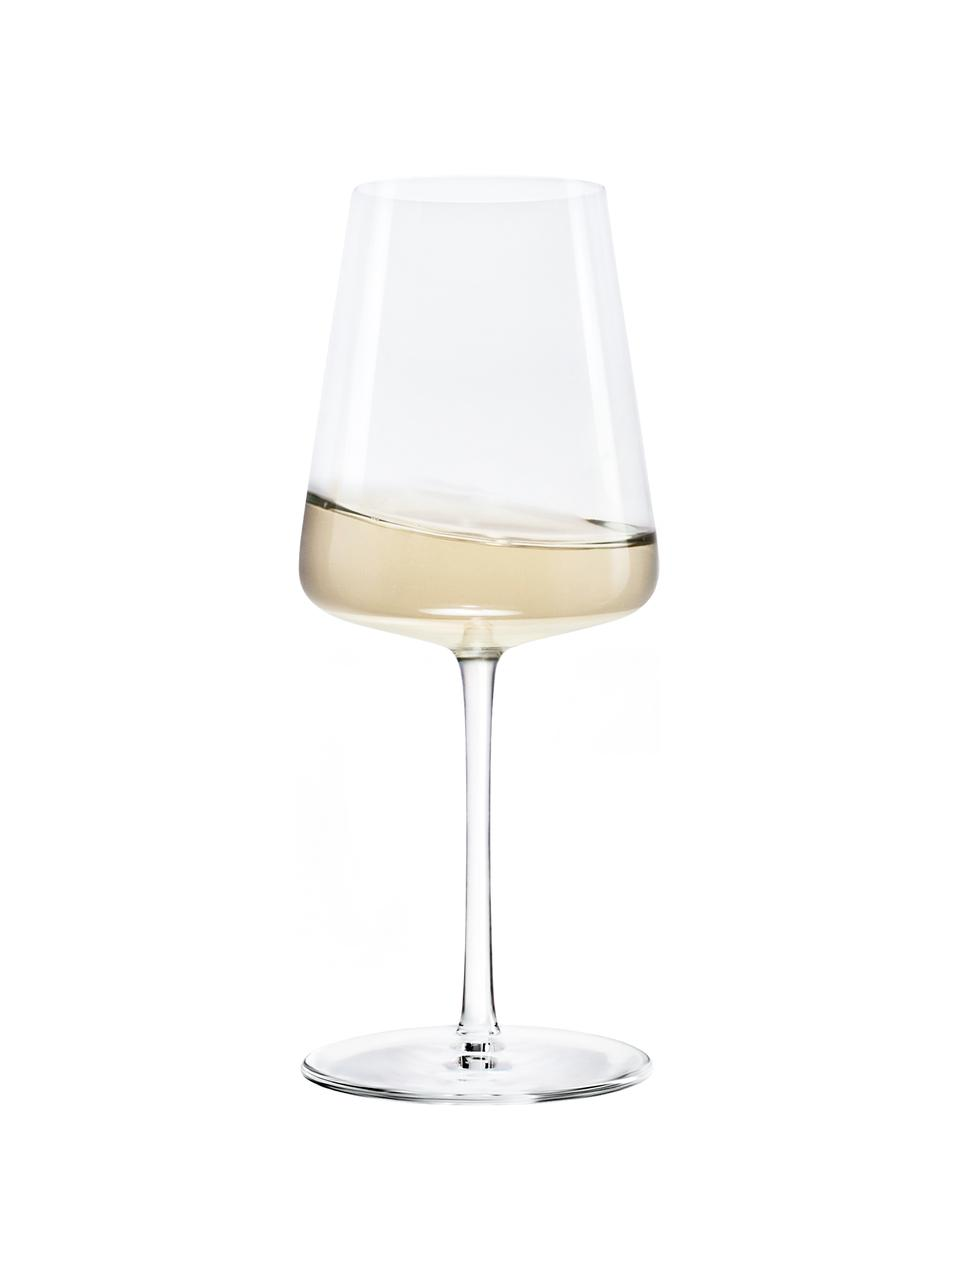 Witte wijnglazen Power in kegelvorm, 6 stuks, Kristalglas, Transparant, Ø 9 x H 21 cm